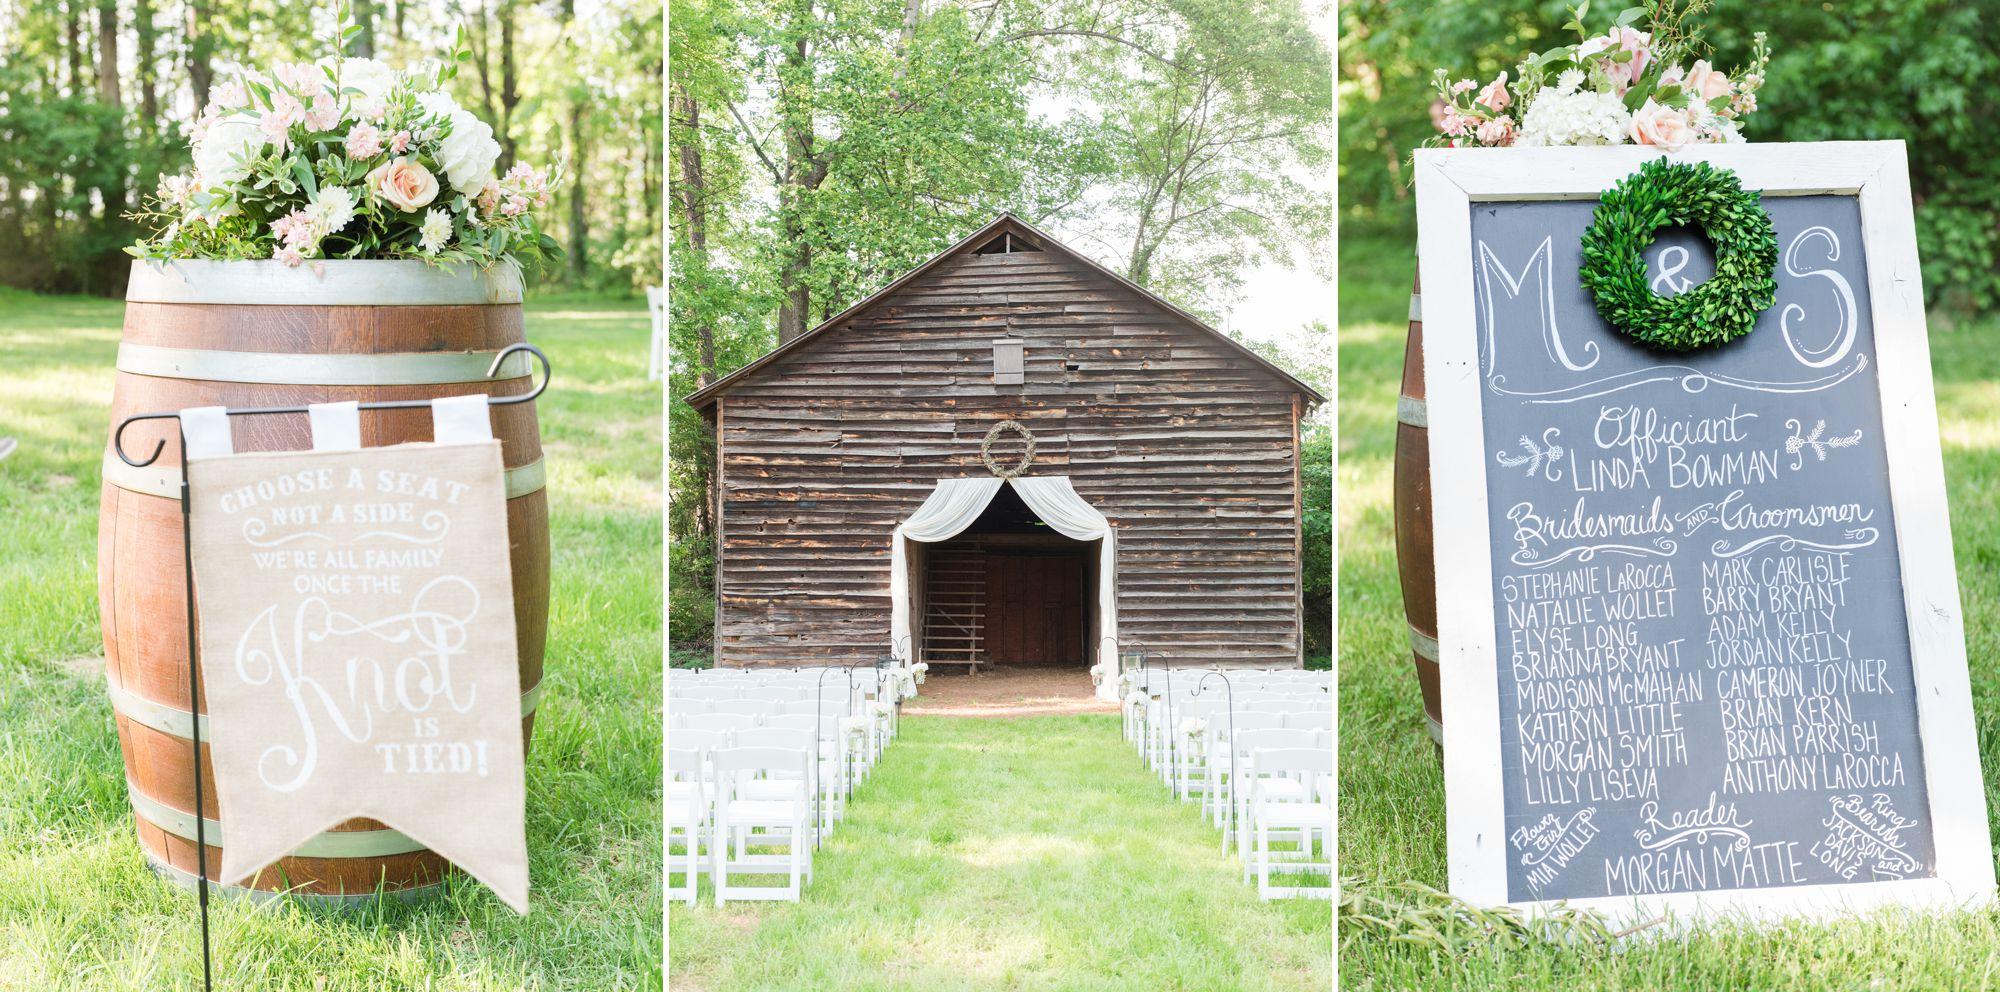 beaver-dam-house-davidson-nc-wedding-photos 41